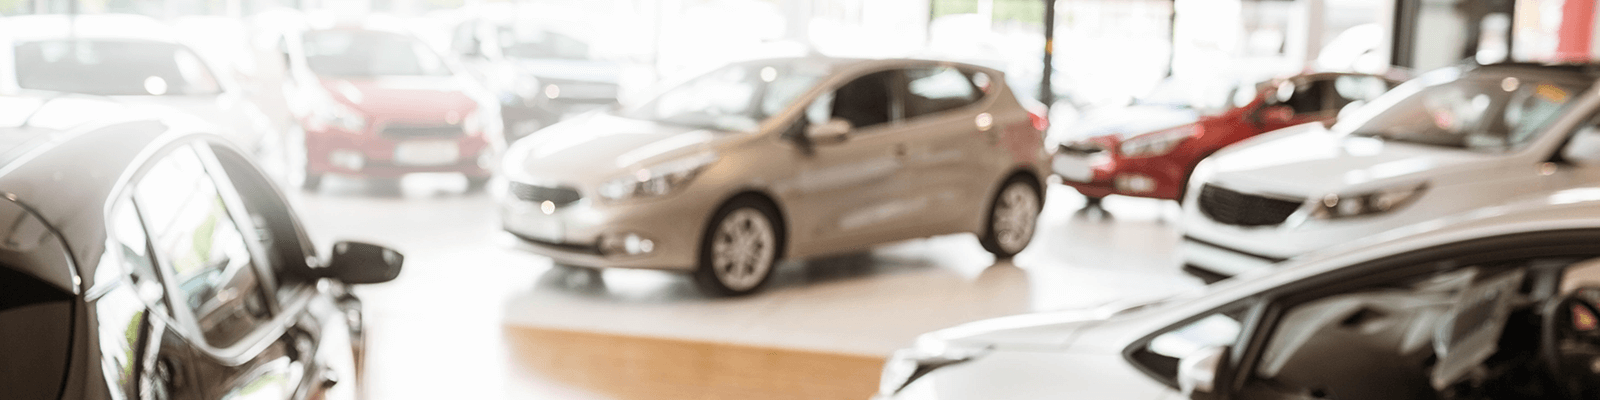 Costello Motors (Galway) Ltd. | Car Dealership Galway ...